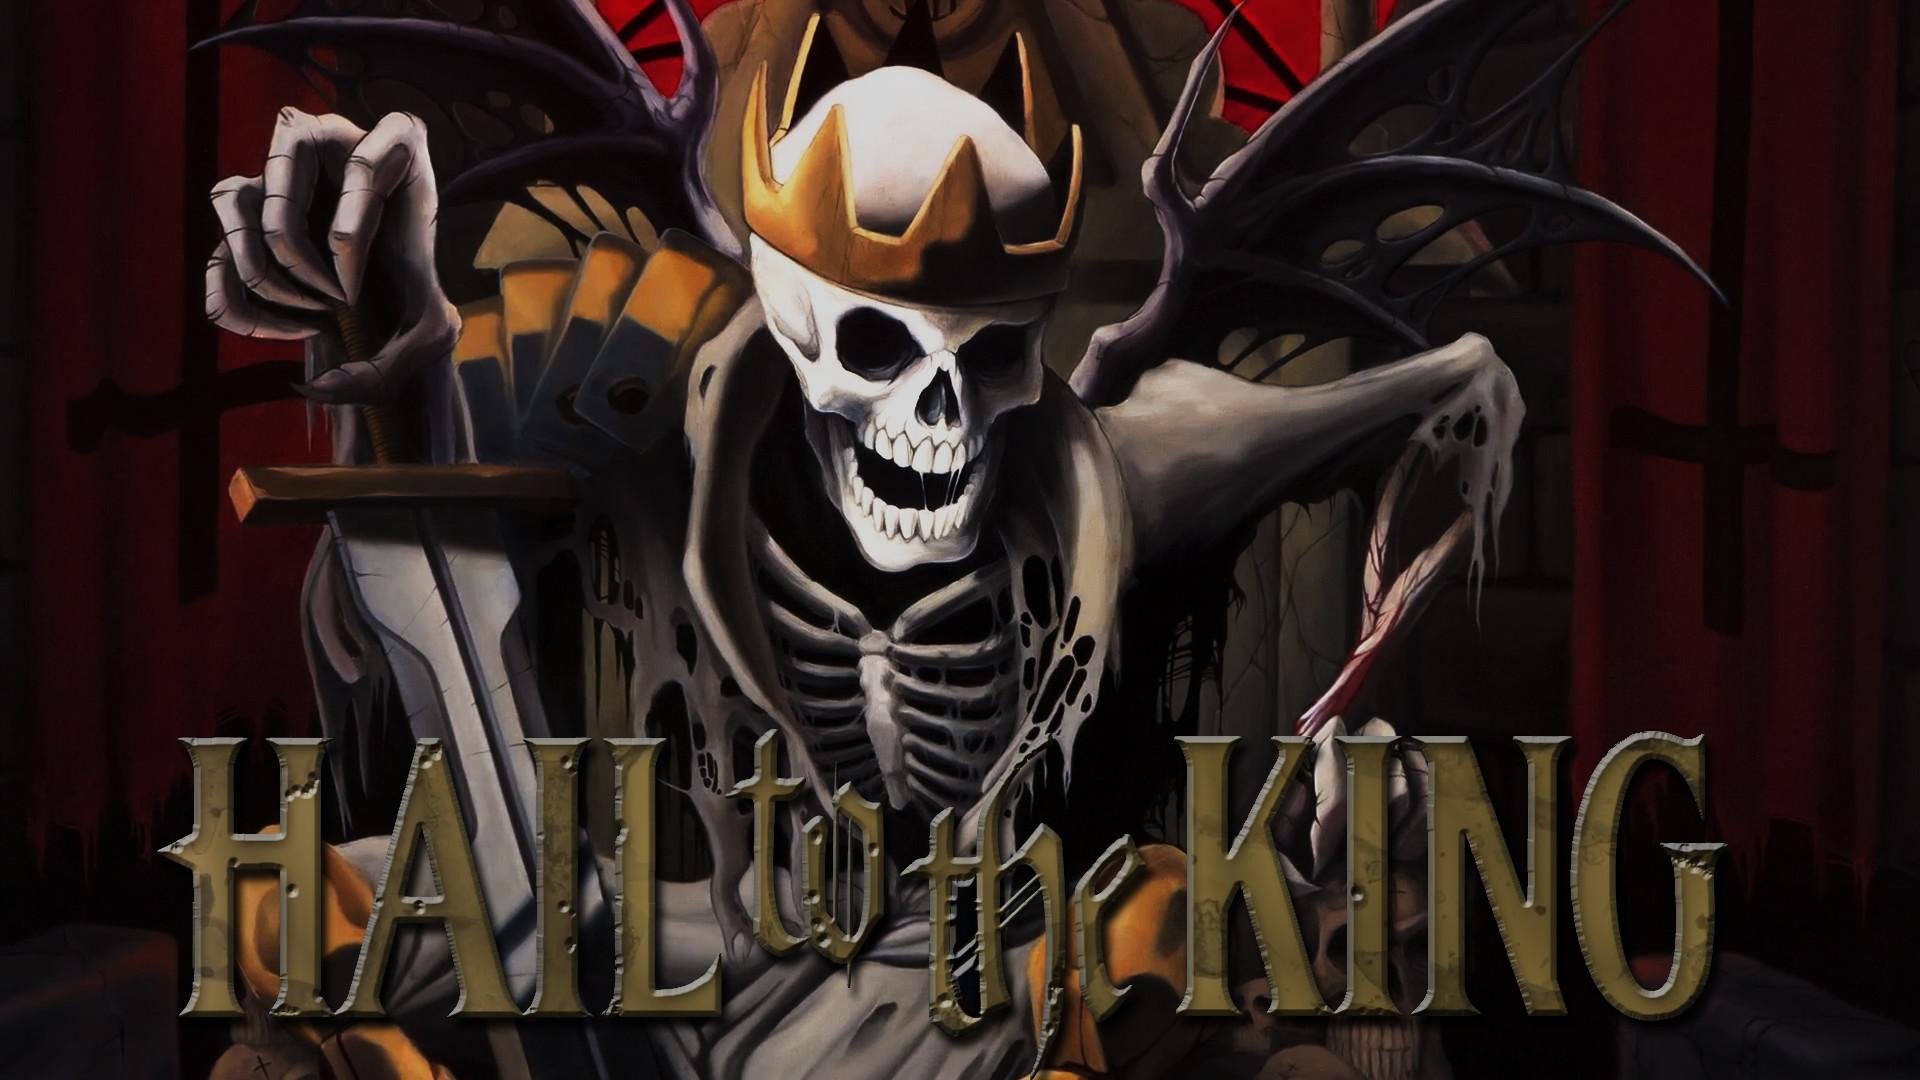 Demon king wallpapers 77 images - King wallpaper ...